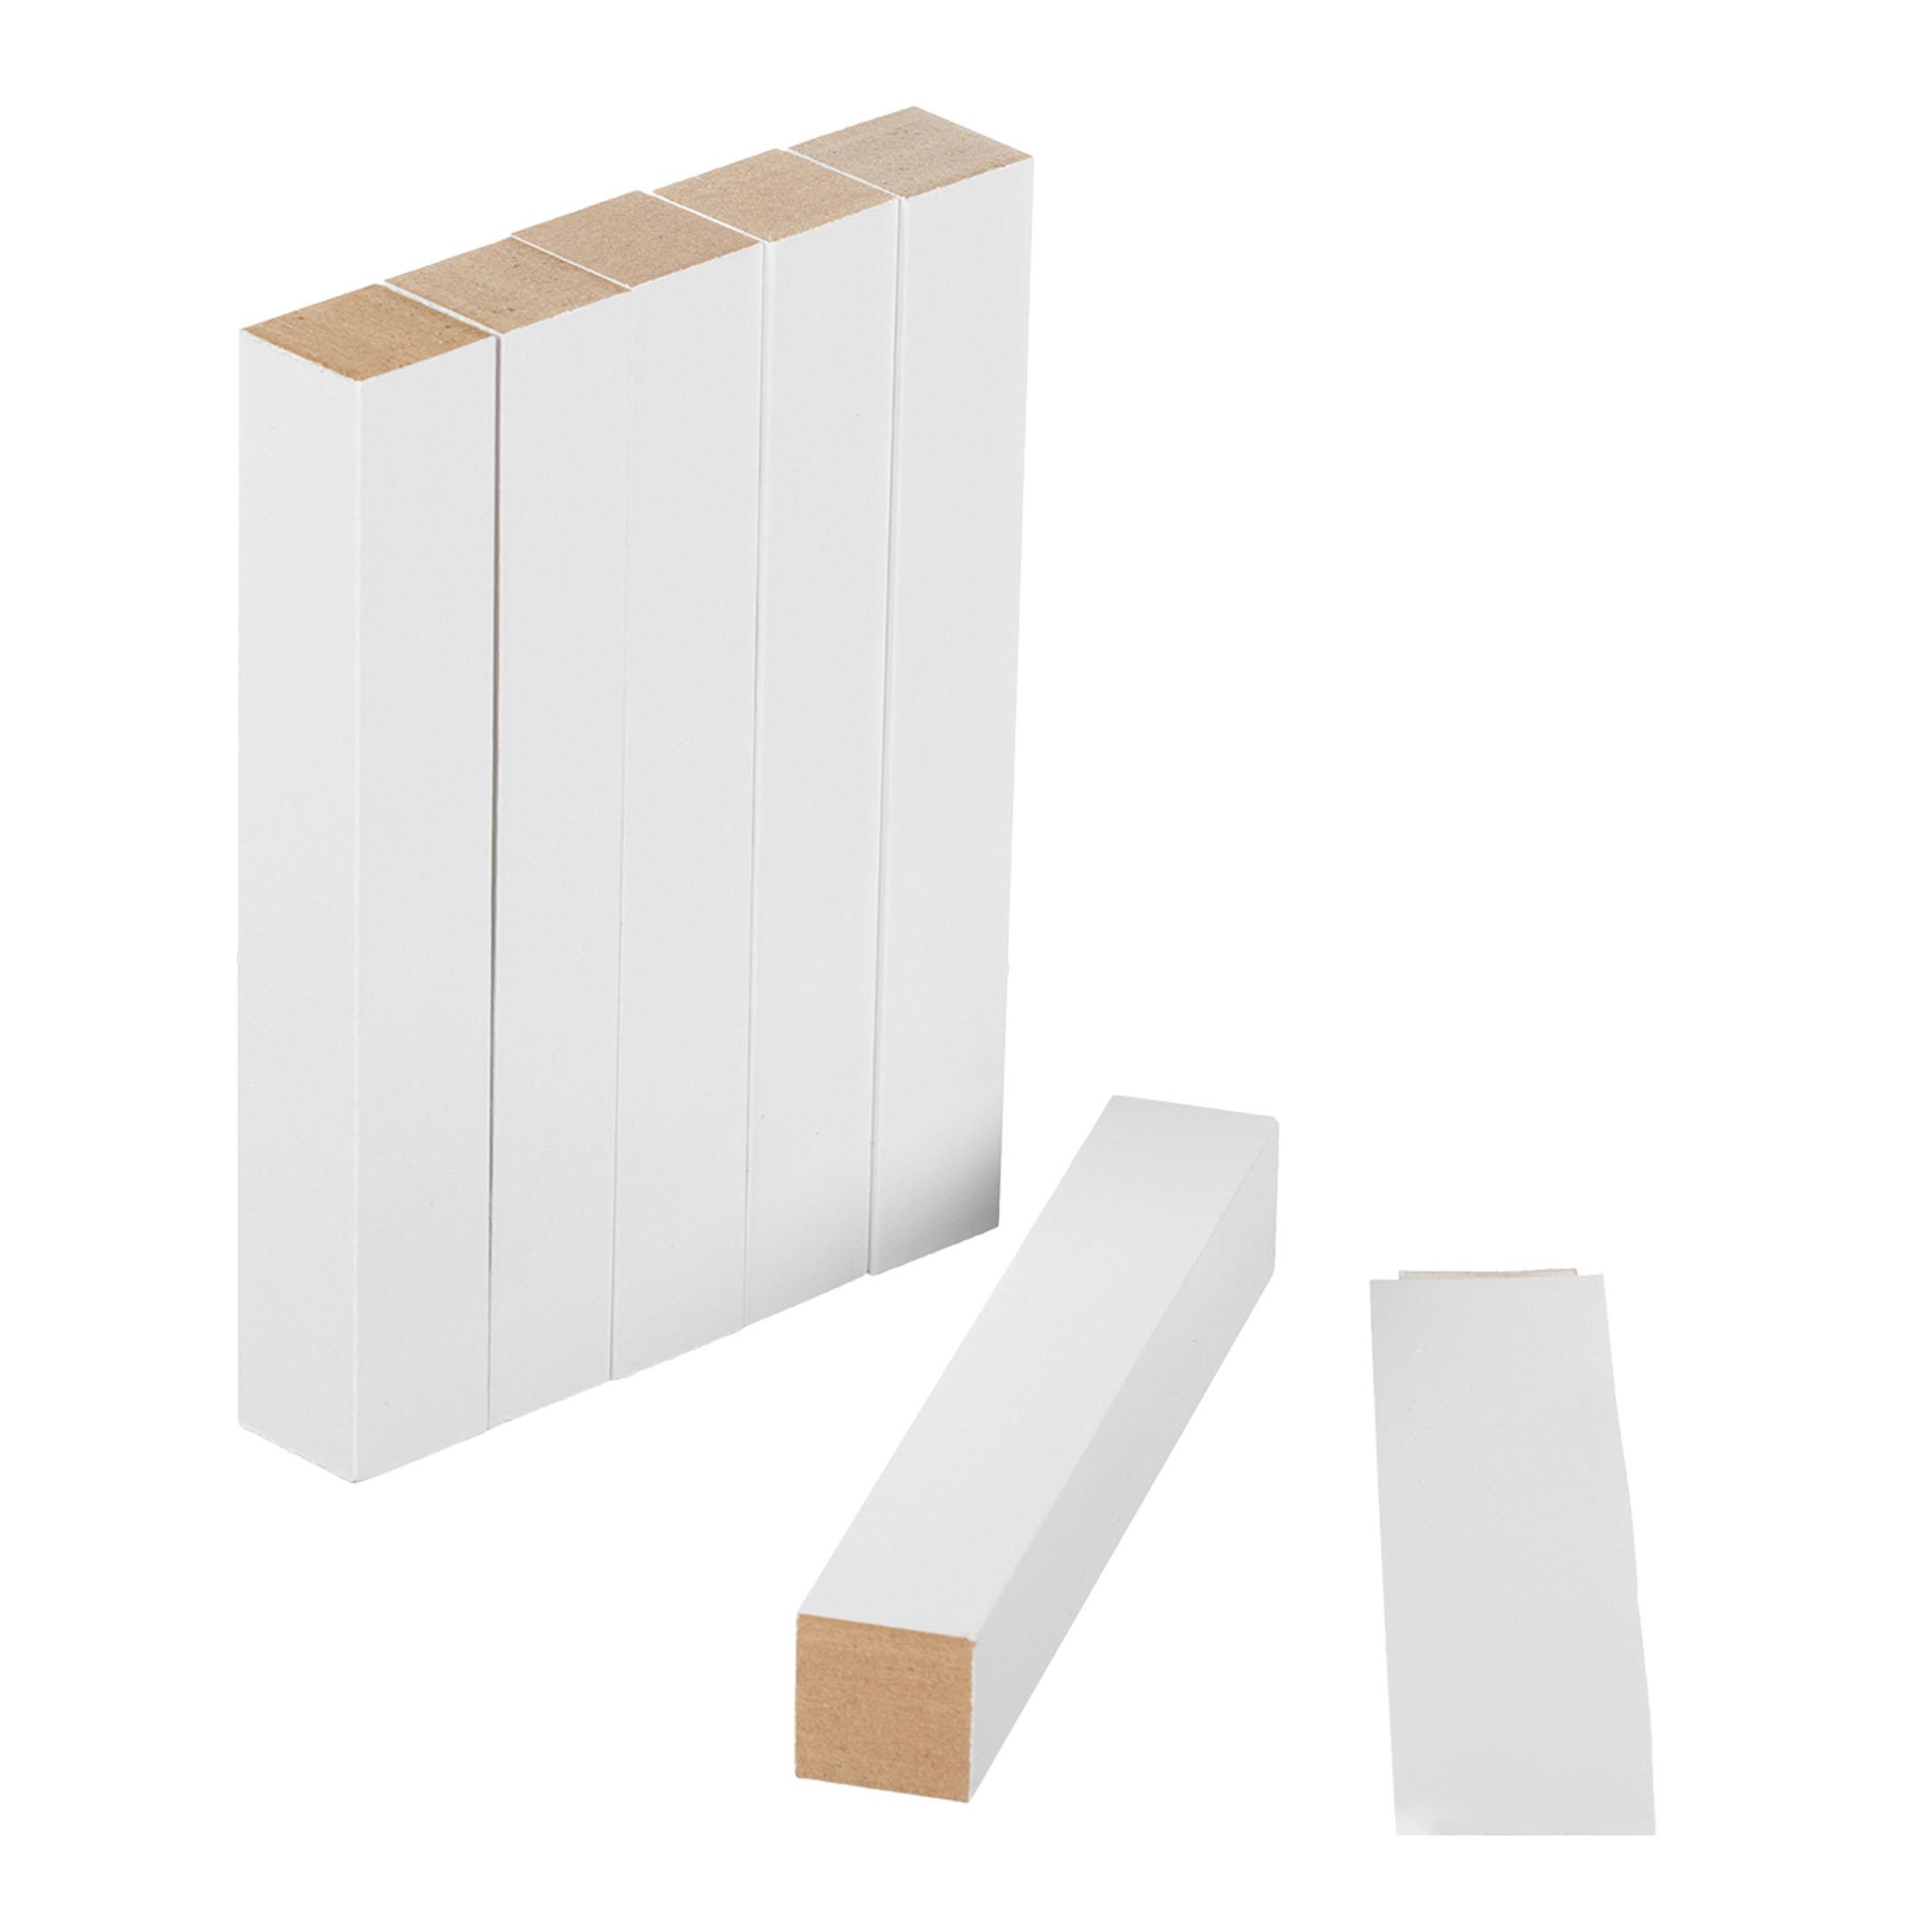 Соединитель для плинтуса МДФ 18х18х122 мм белый под покраску (6 шт.) профиль рамочный мдф 55х16х2070 мм цвет белый